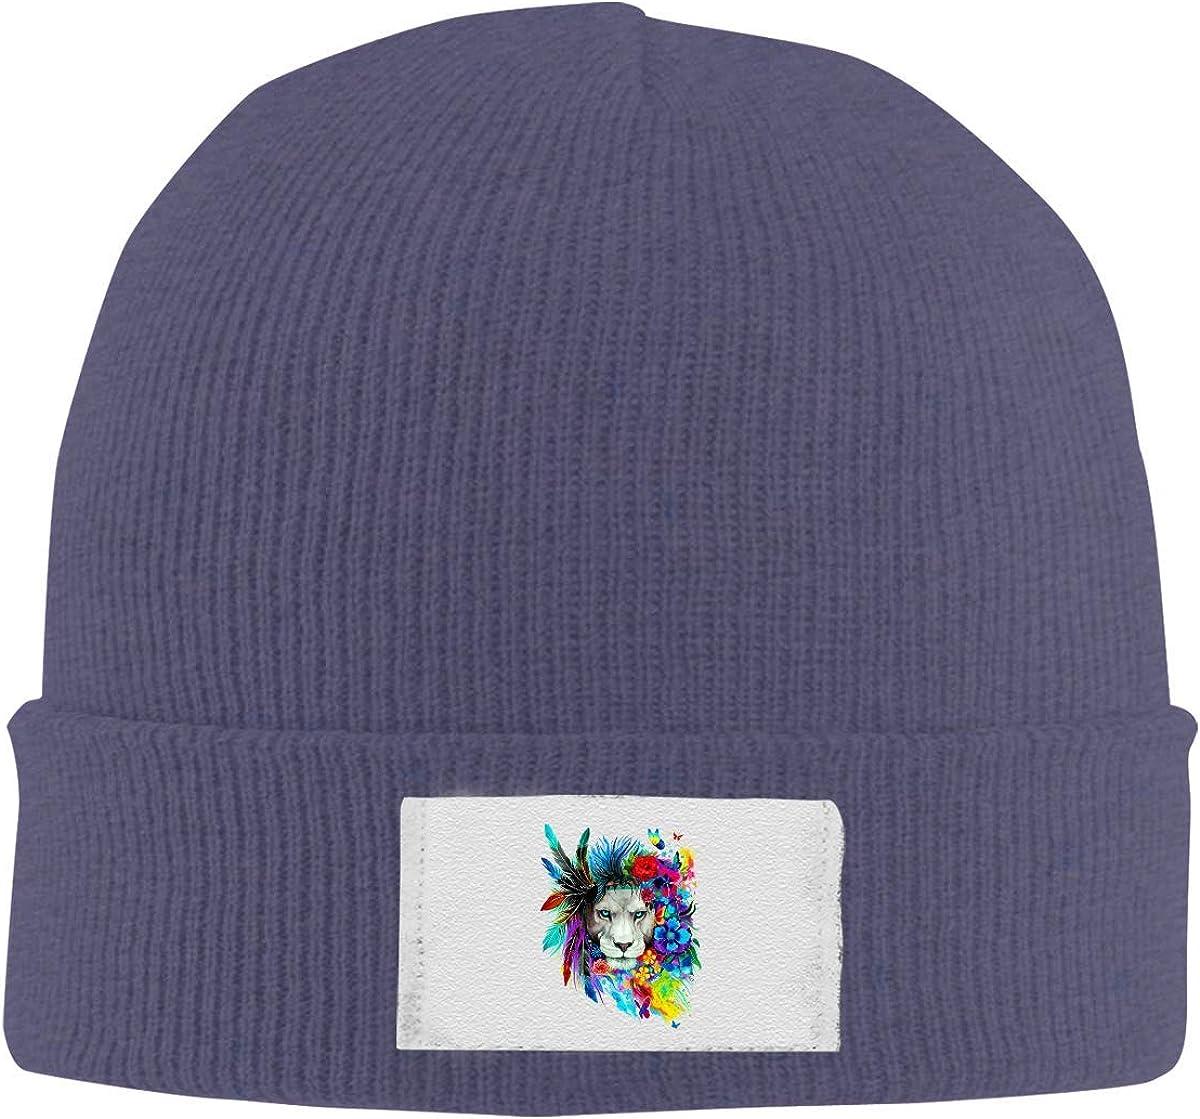 XCNGG Gorro Unisex, Sombrero clásico de Color sólido cálido con Cobertura de León de Plumas para Invierno Diario al Aire Libre